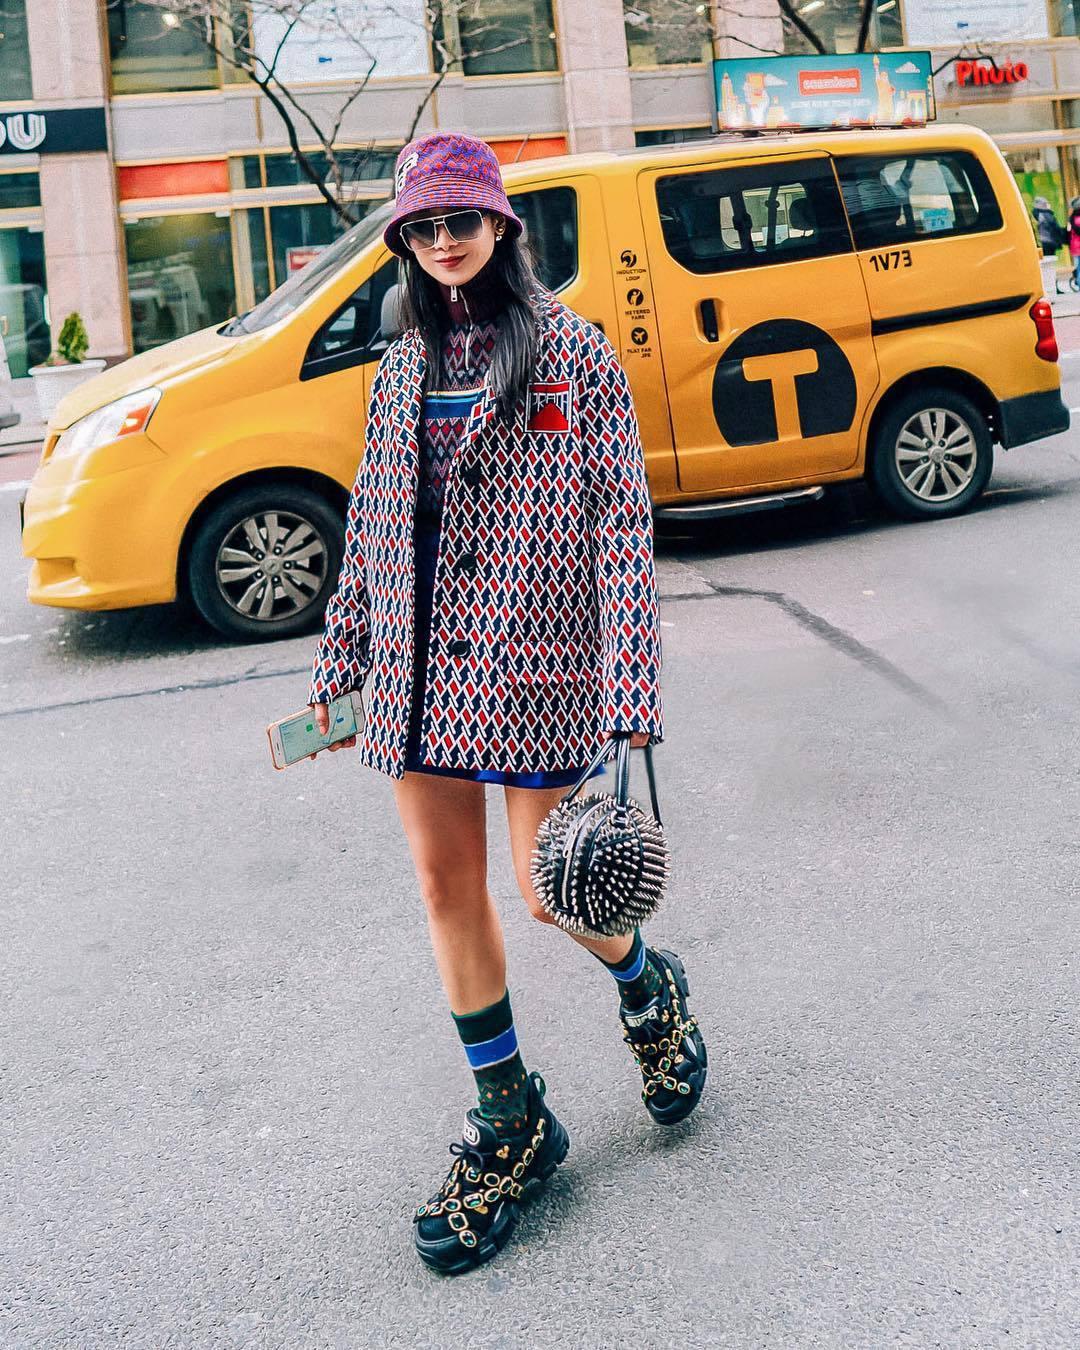 bag gucci bag black bag basket bag black shoes socks coat prada turtleneck sweater mini skirt printed bucket hat